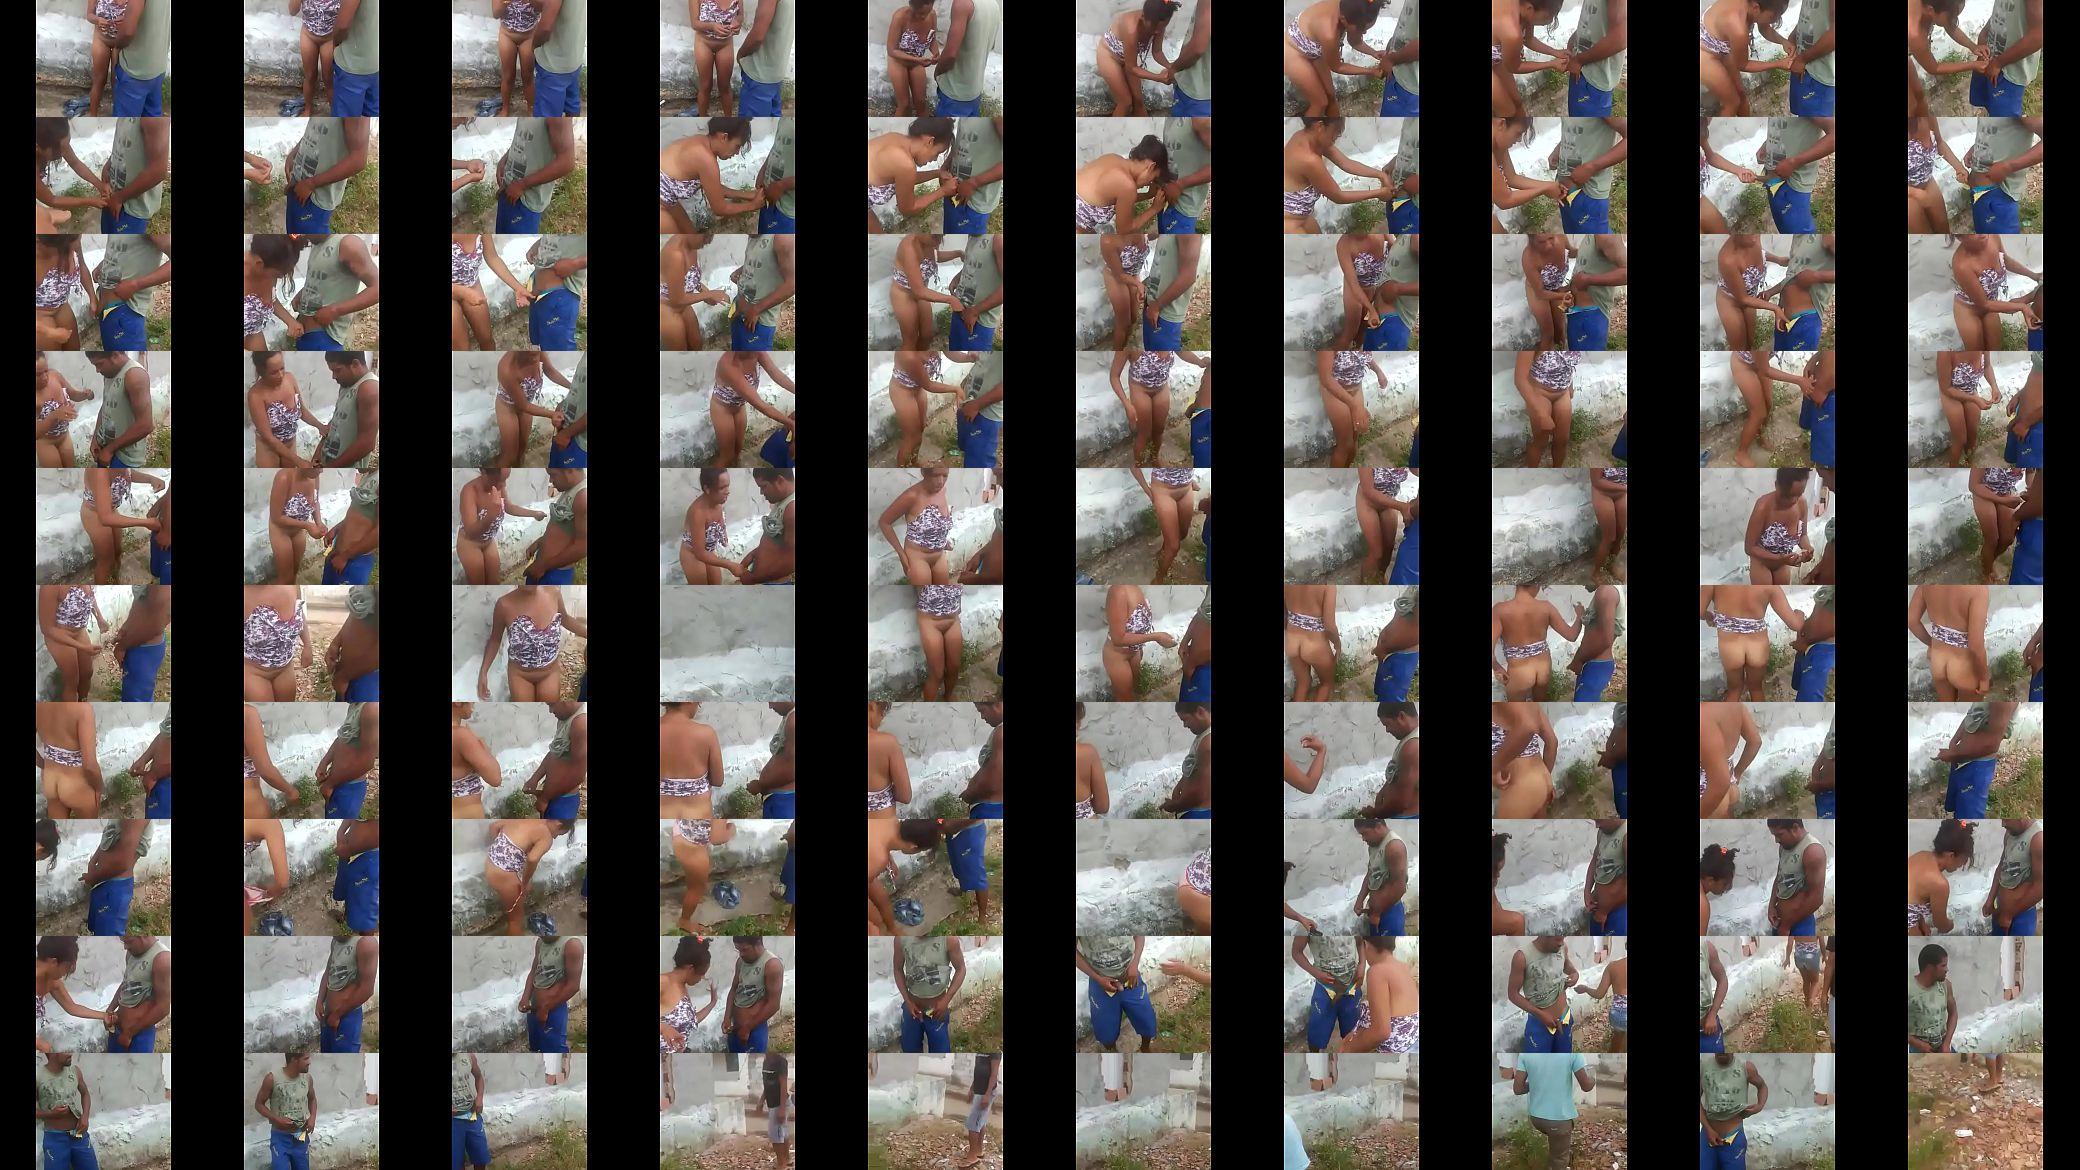 naked videos tubes